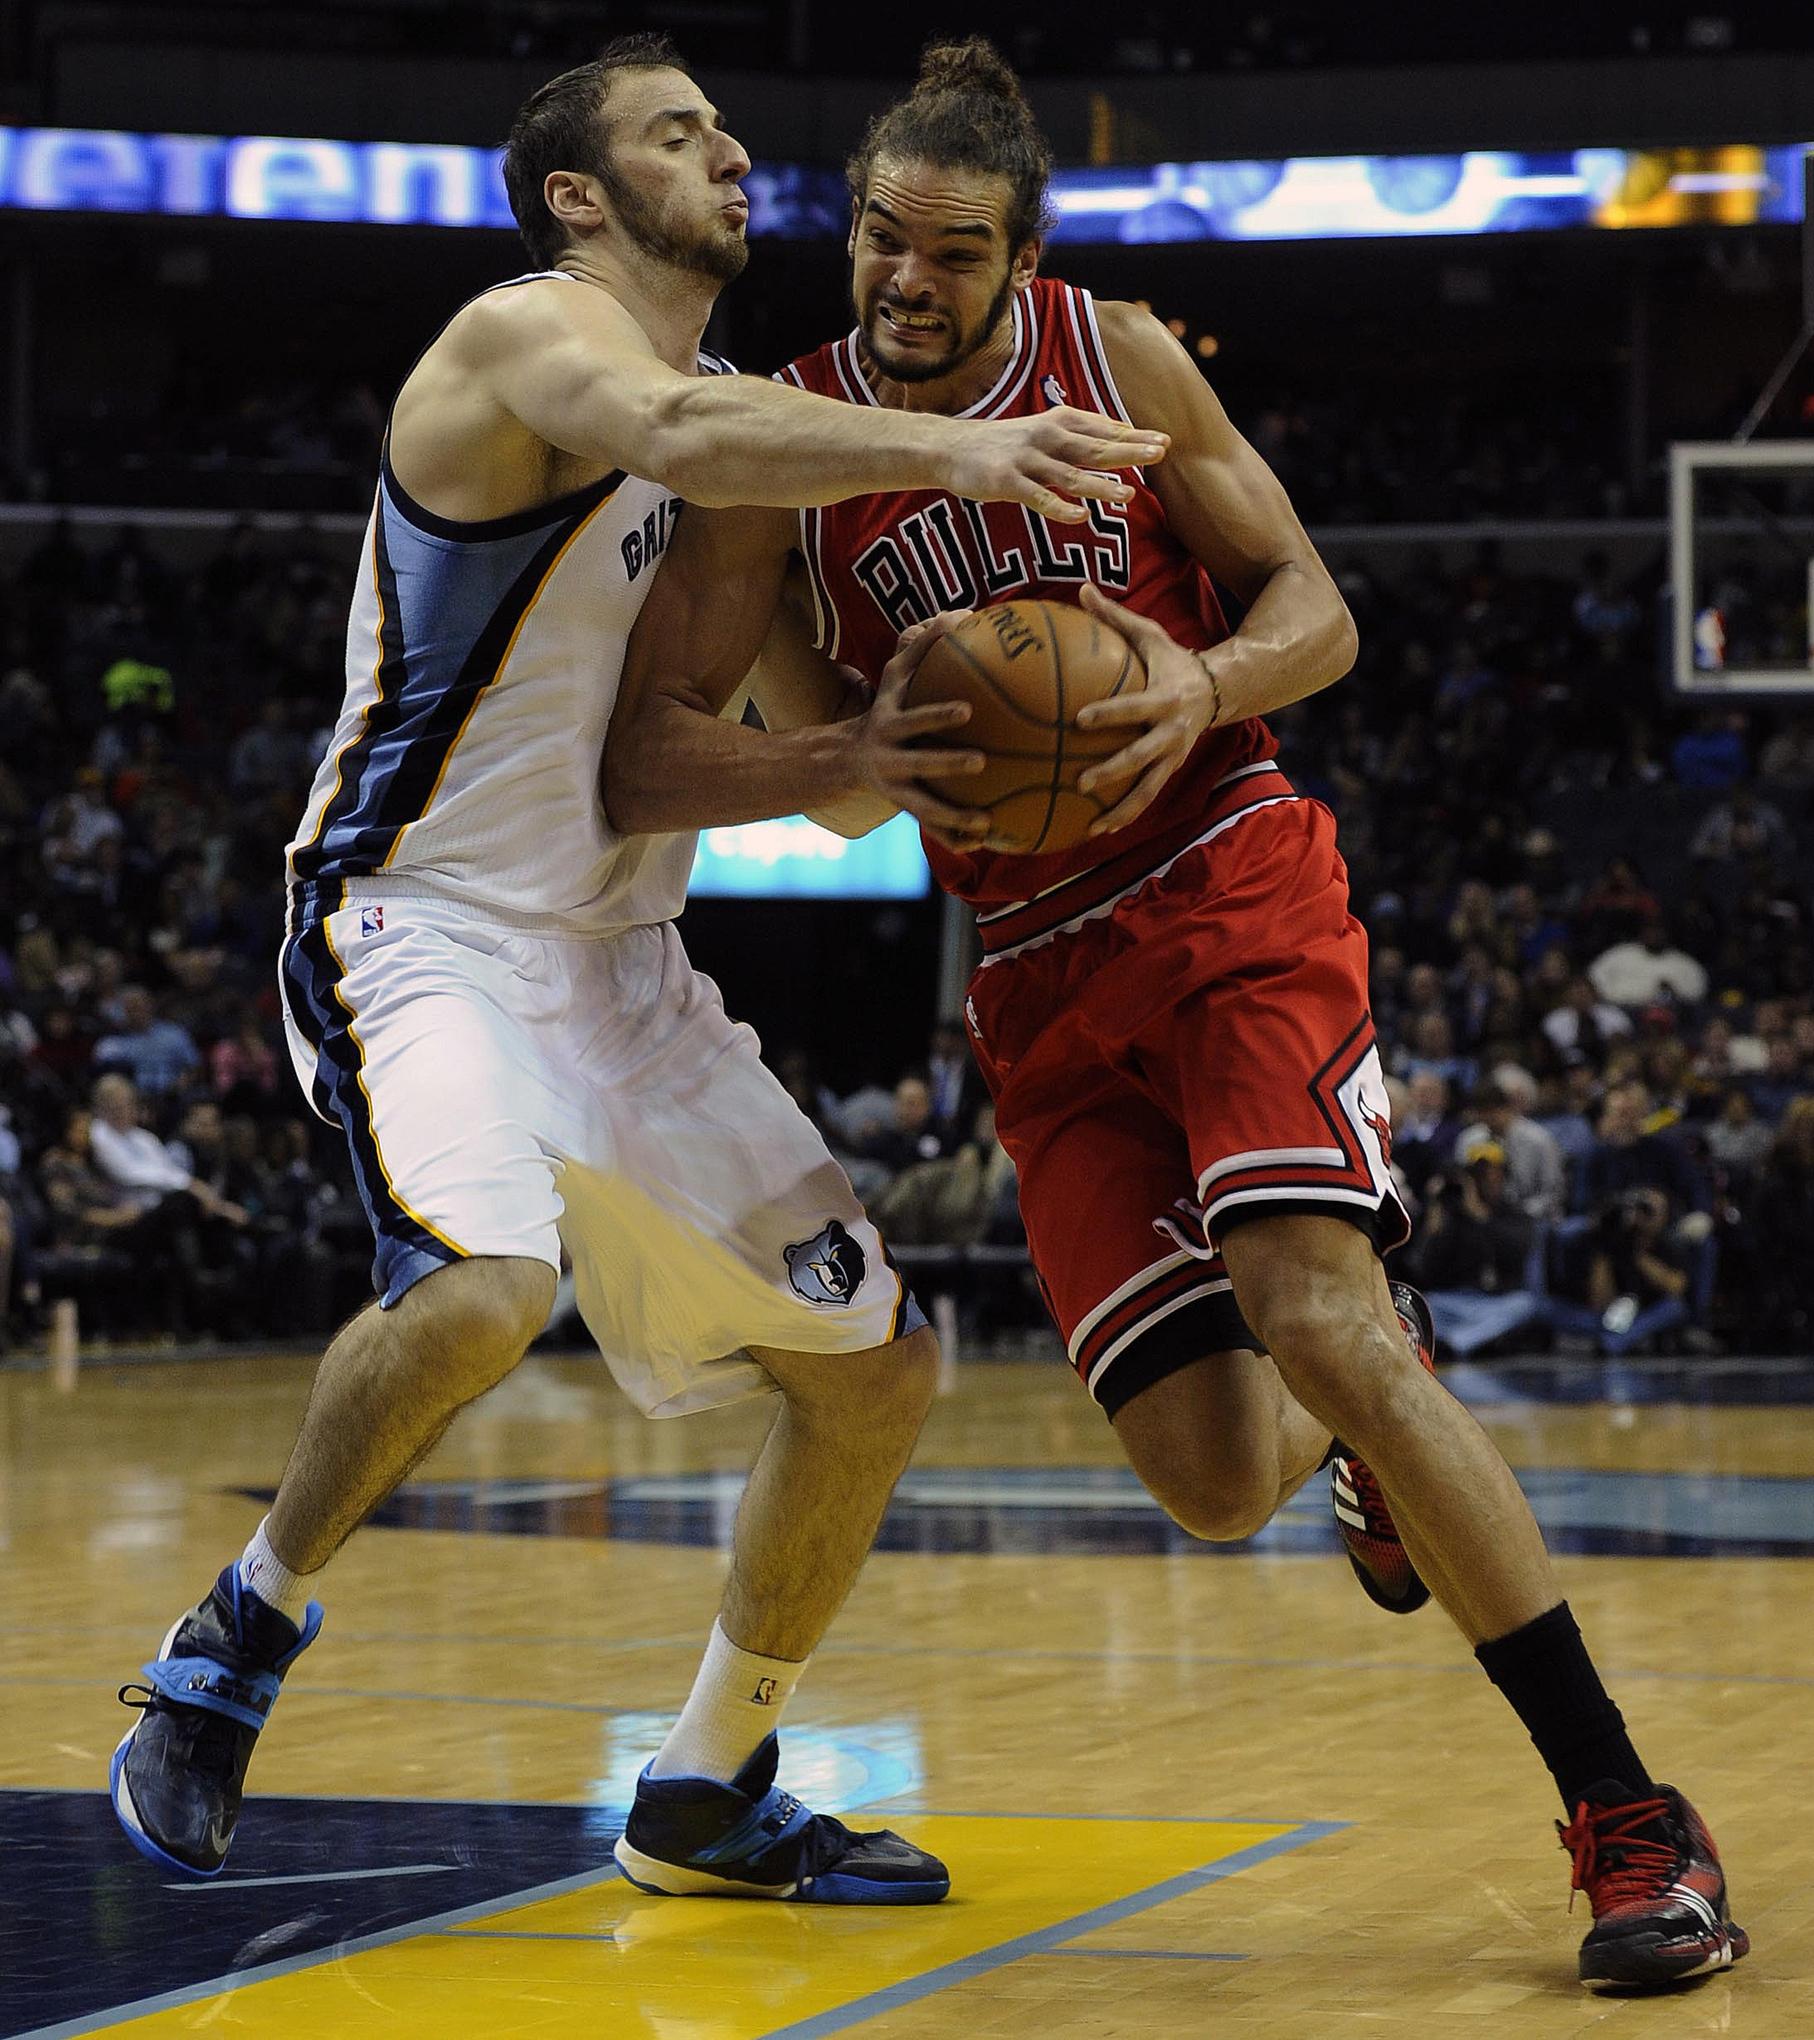 Nuggets Vs Rockets 2014: NBA Regular Season 2013-14 Memphis Grizzlies Season